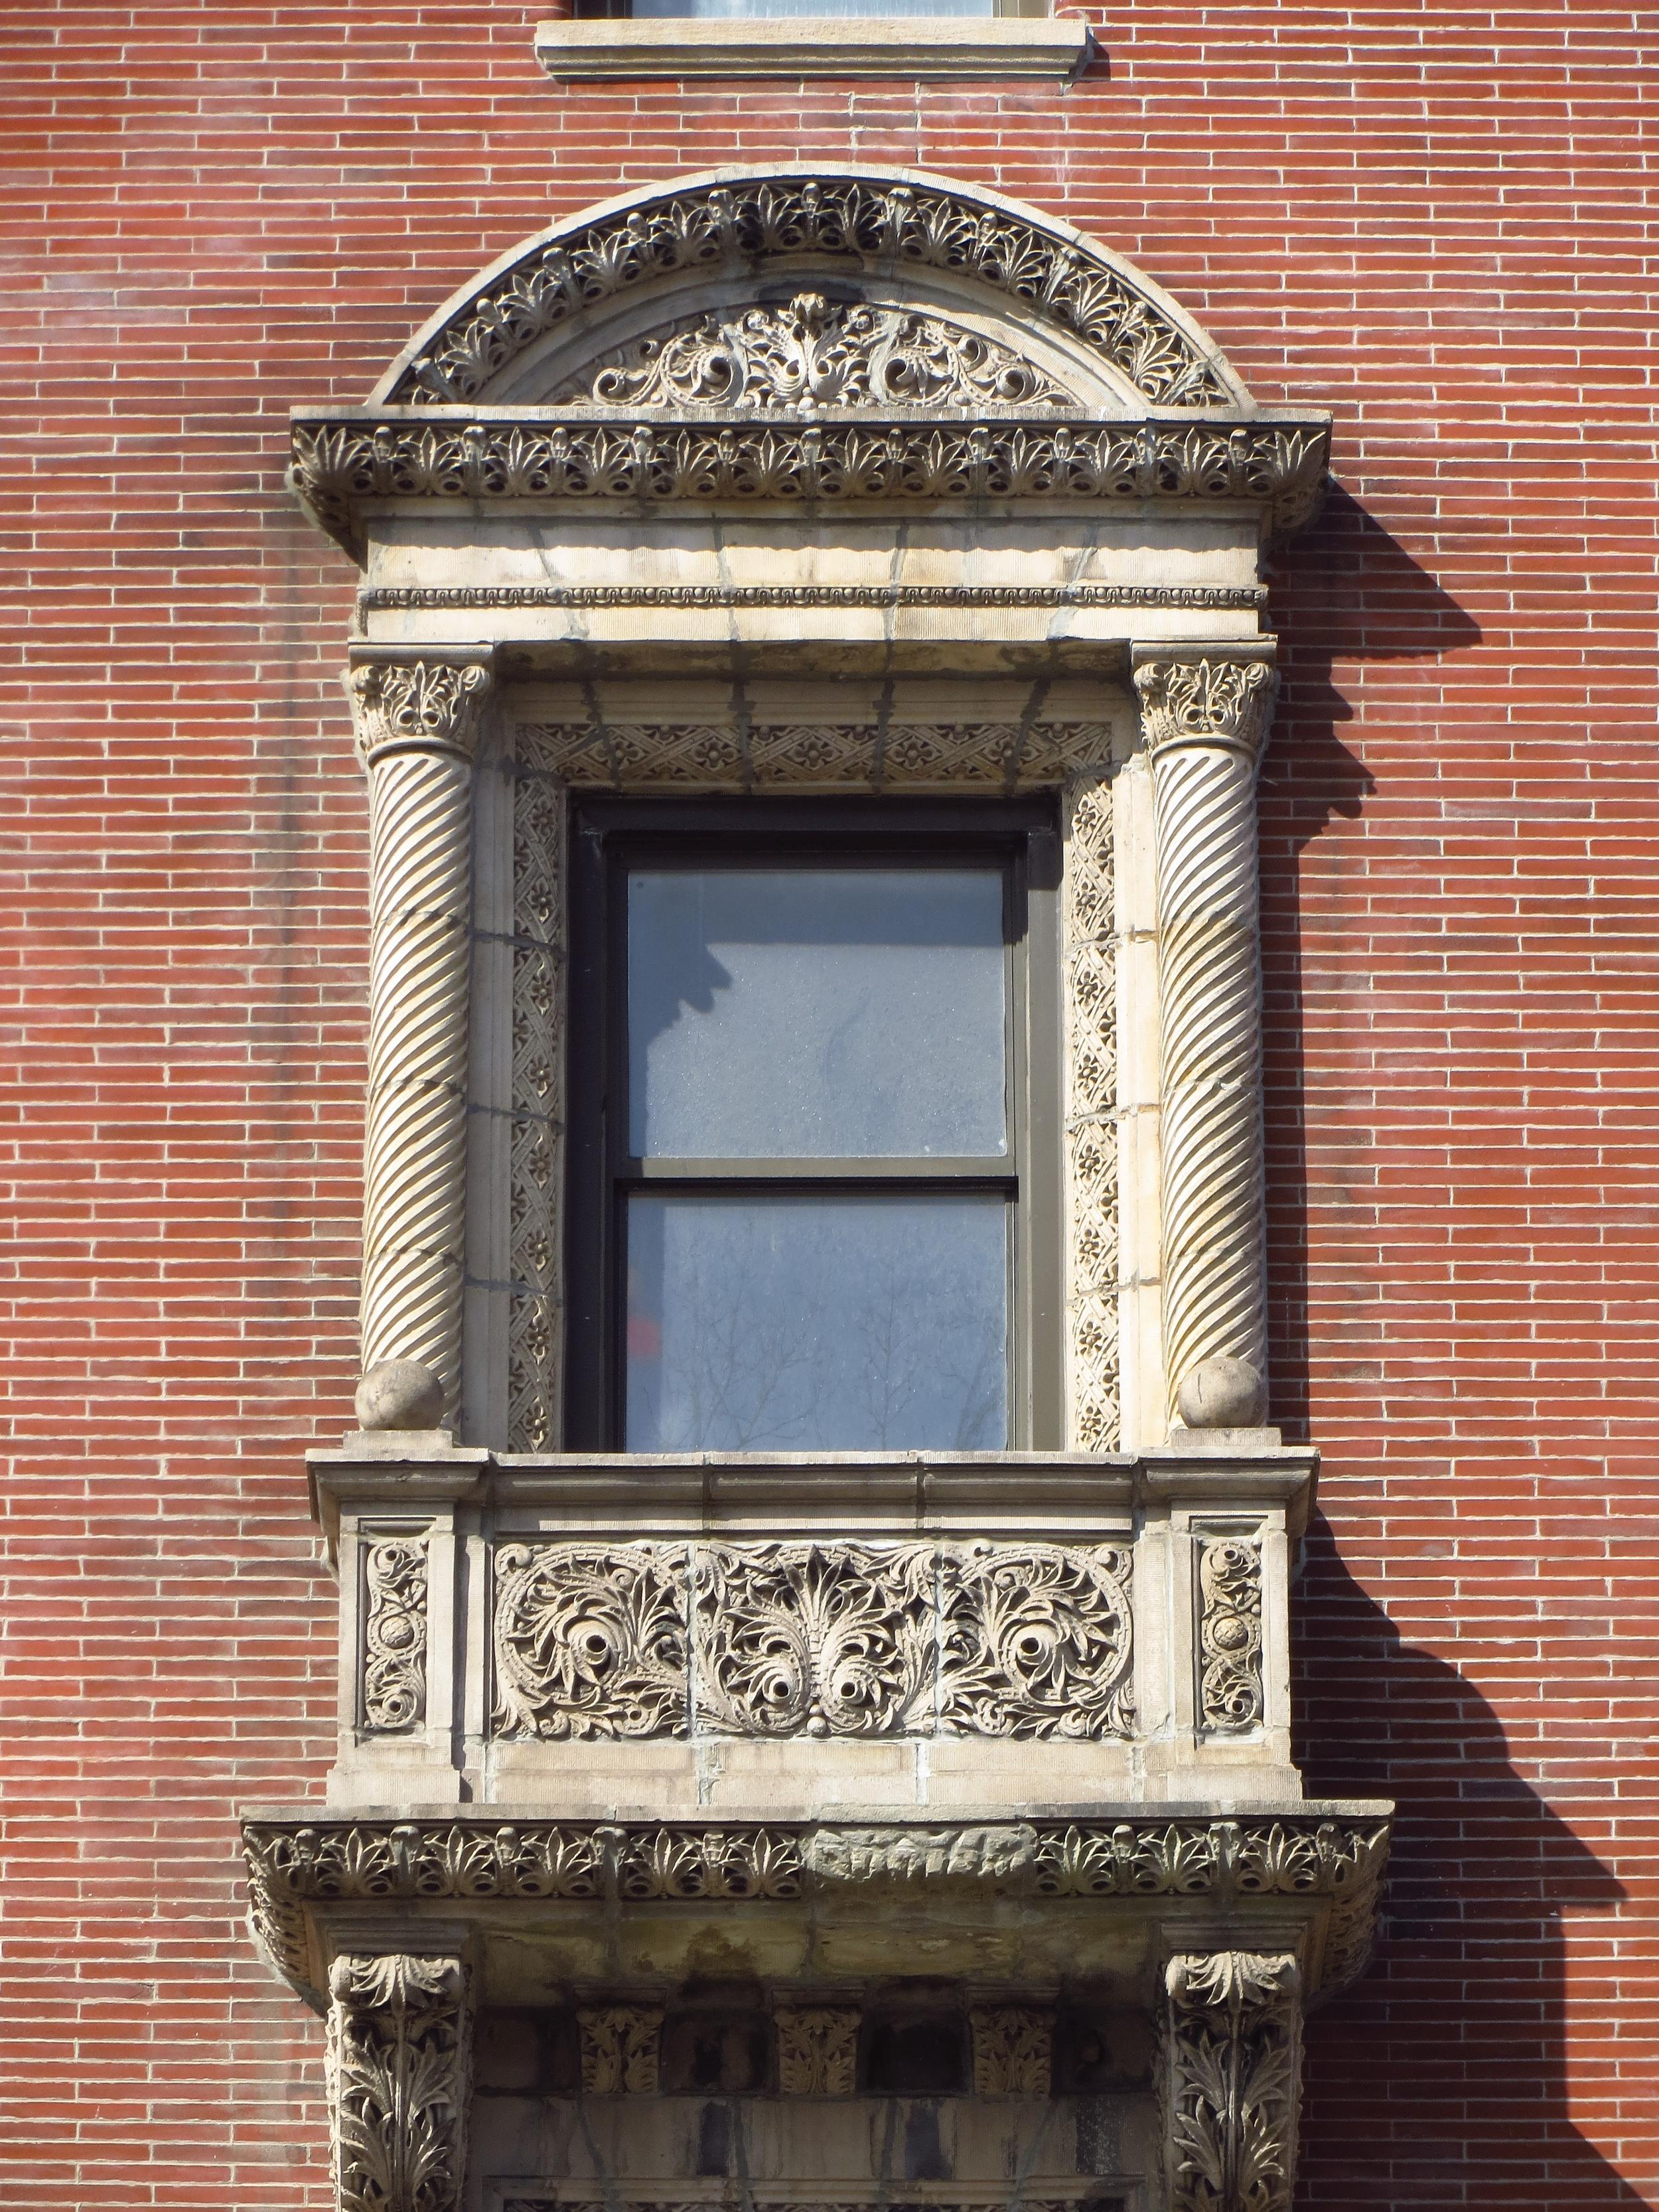 Cool window ornamentation